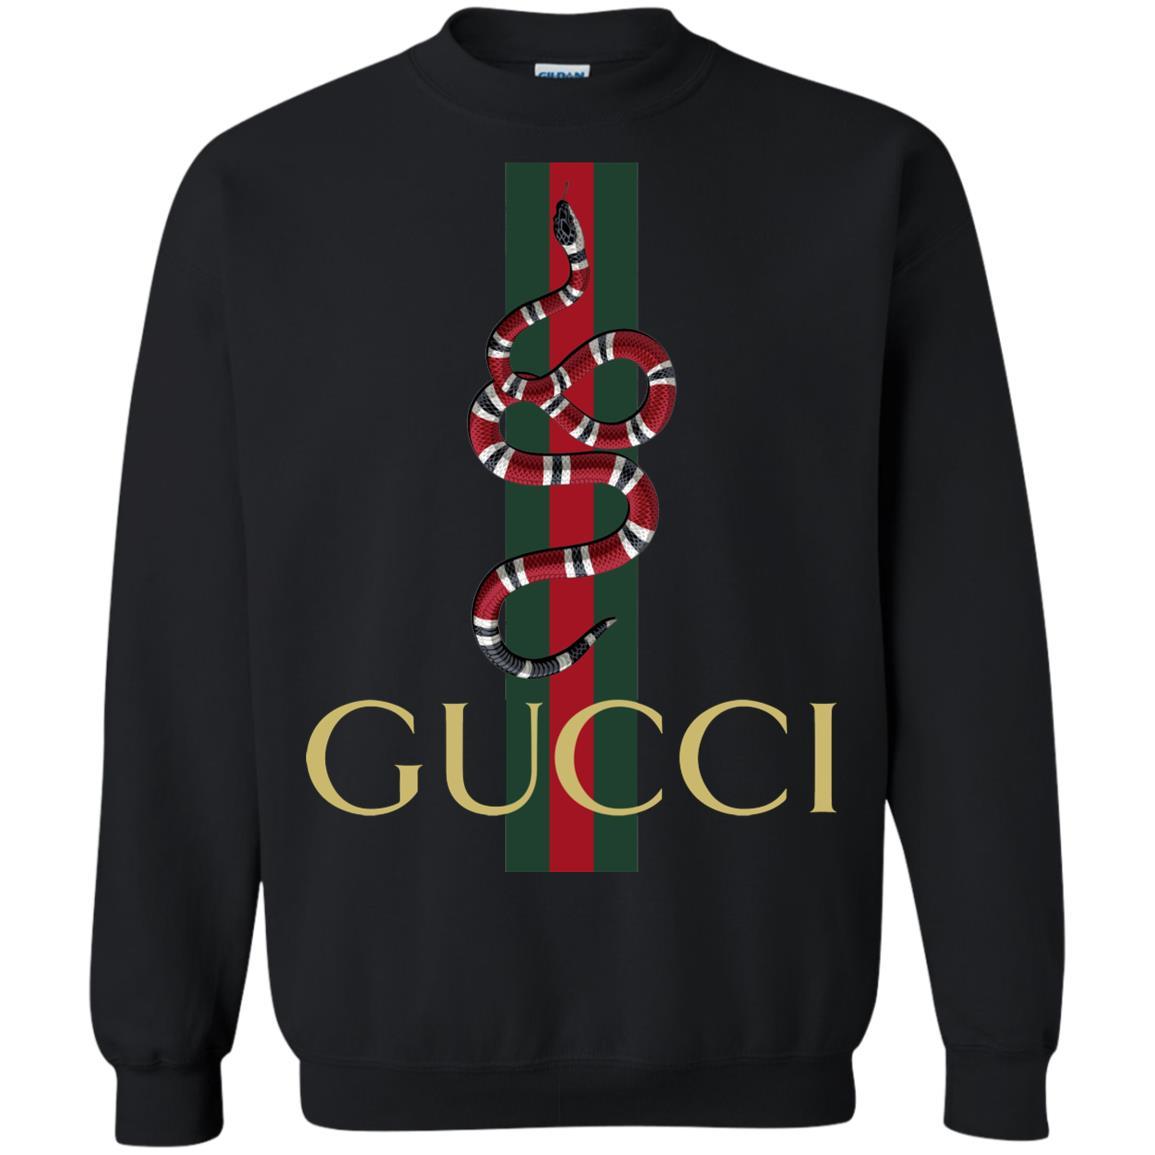 8d69f5922f3 Gucci Snake shirt - image 4041 510x510